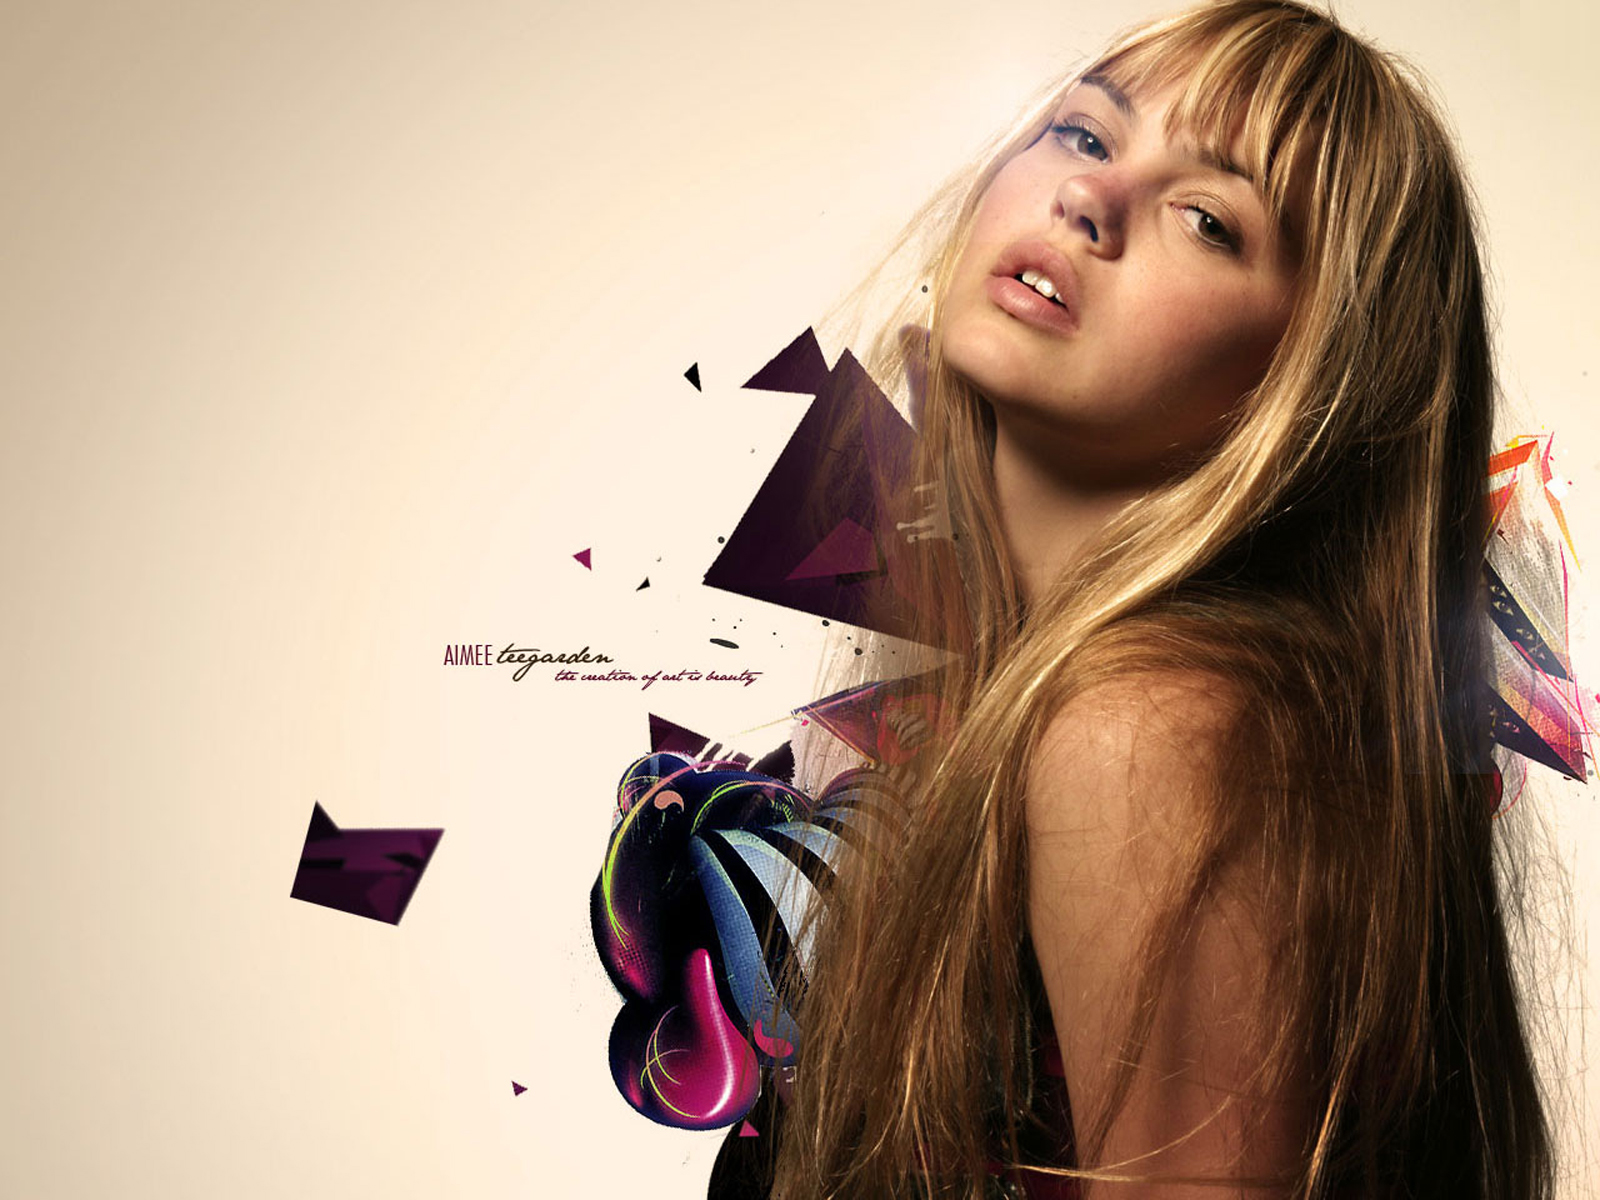 http://1.bp.blogspot.com/-_5l7Hcr6zHY/Tf4x_KKSBVI/AAAAAAAABkg/8C_zvj0z8_8/s1600/Aimee-Teegarden-Wallpapers.jpg